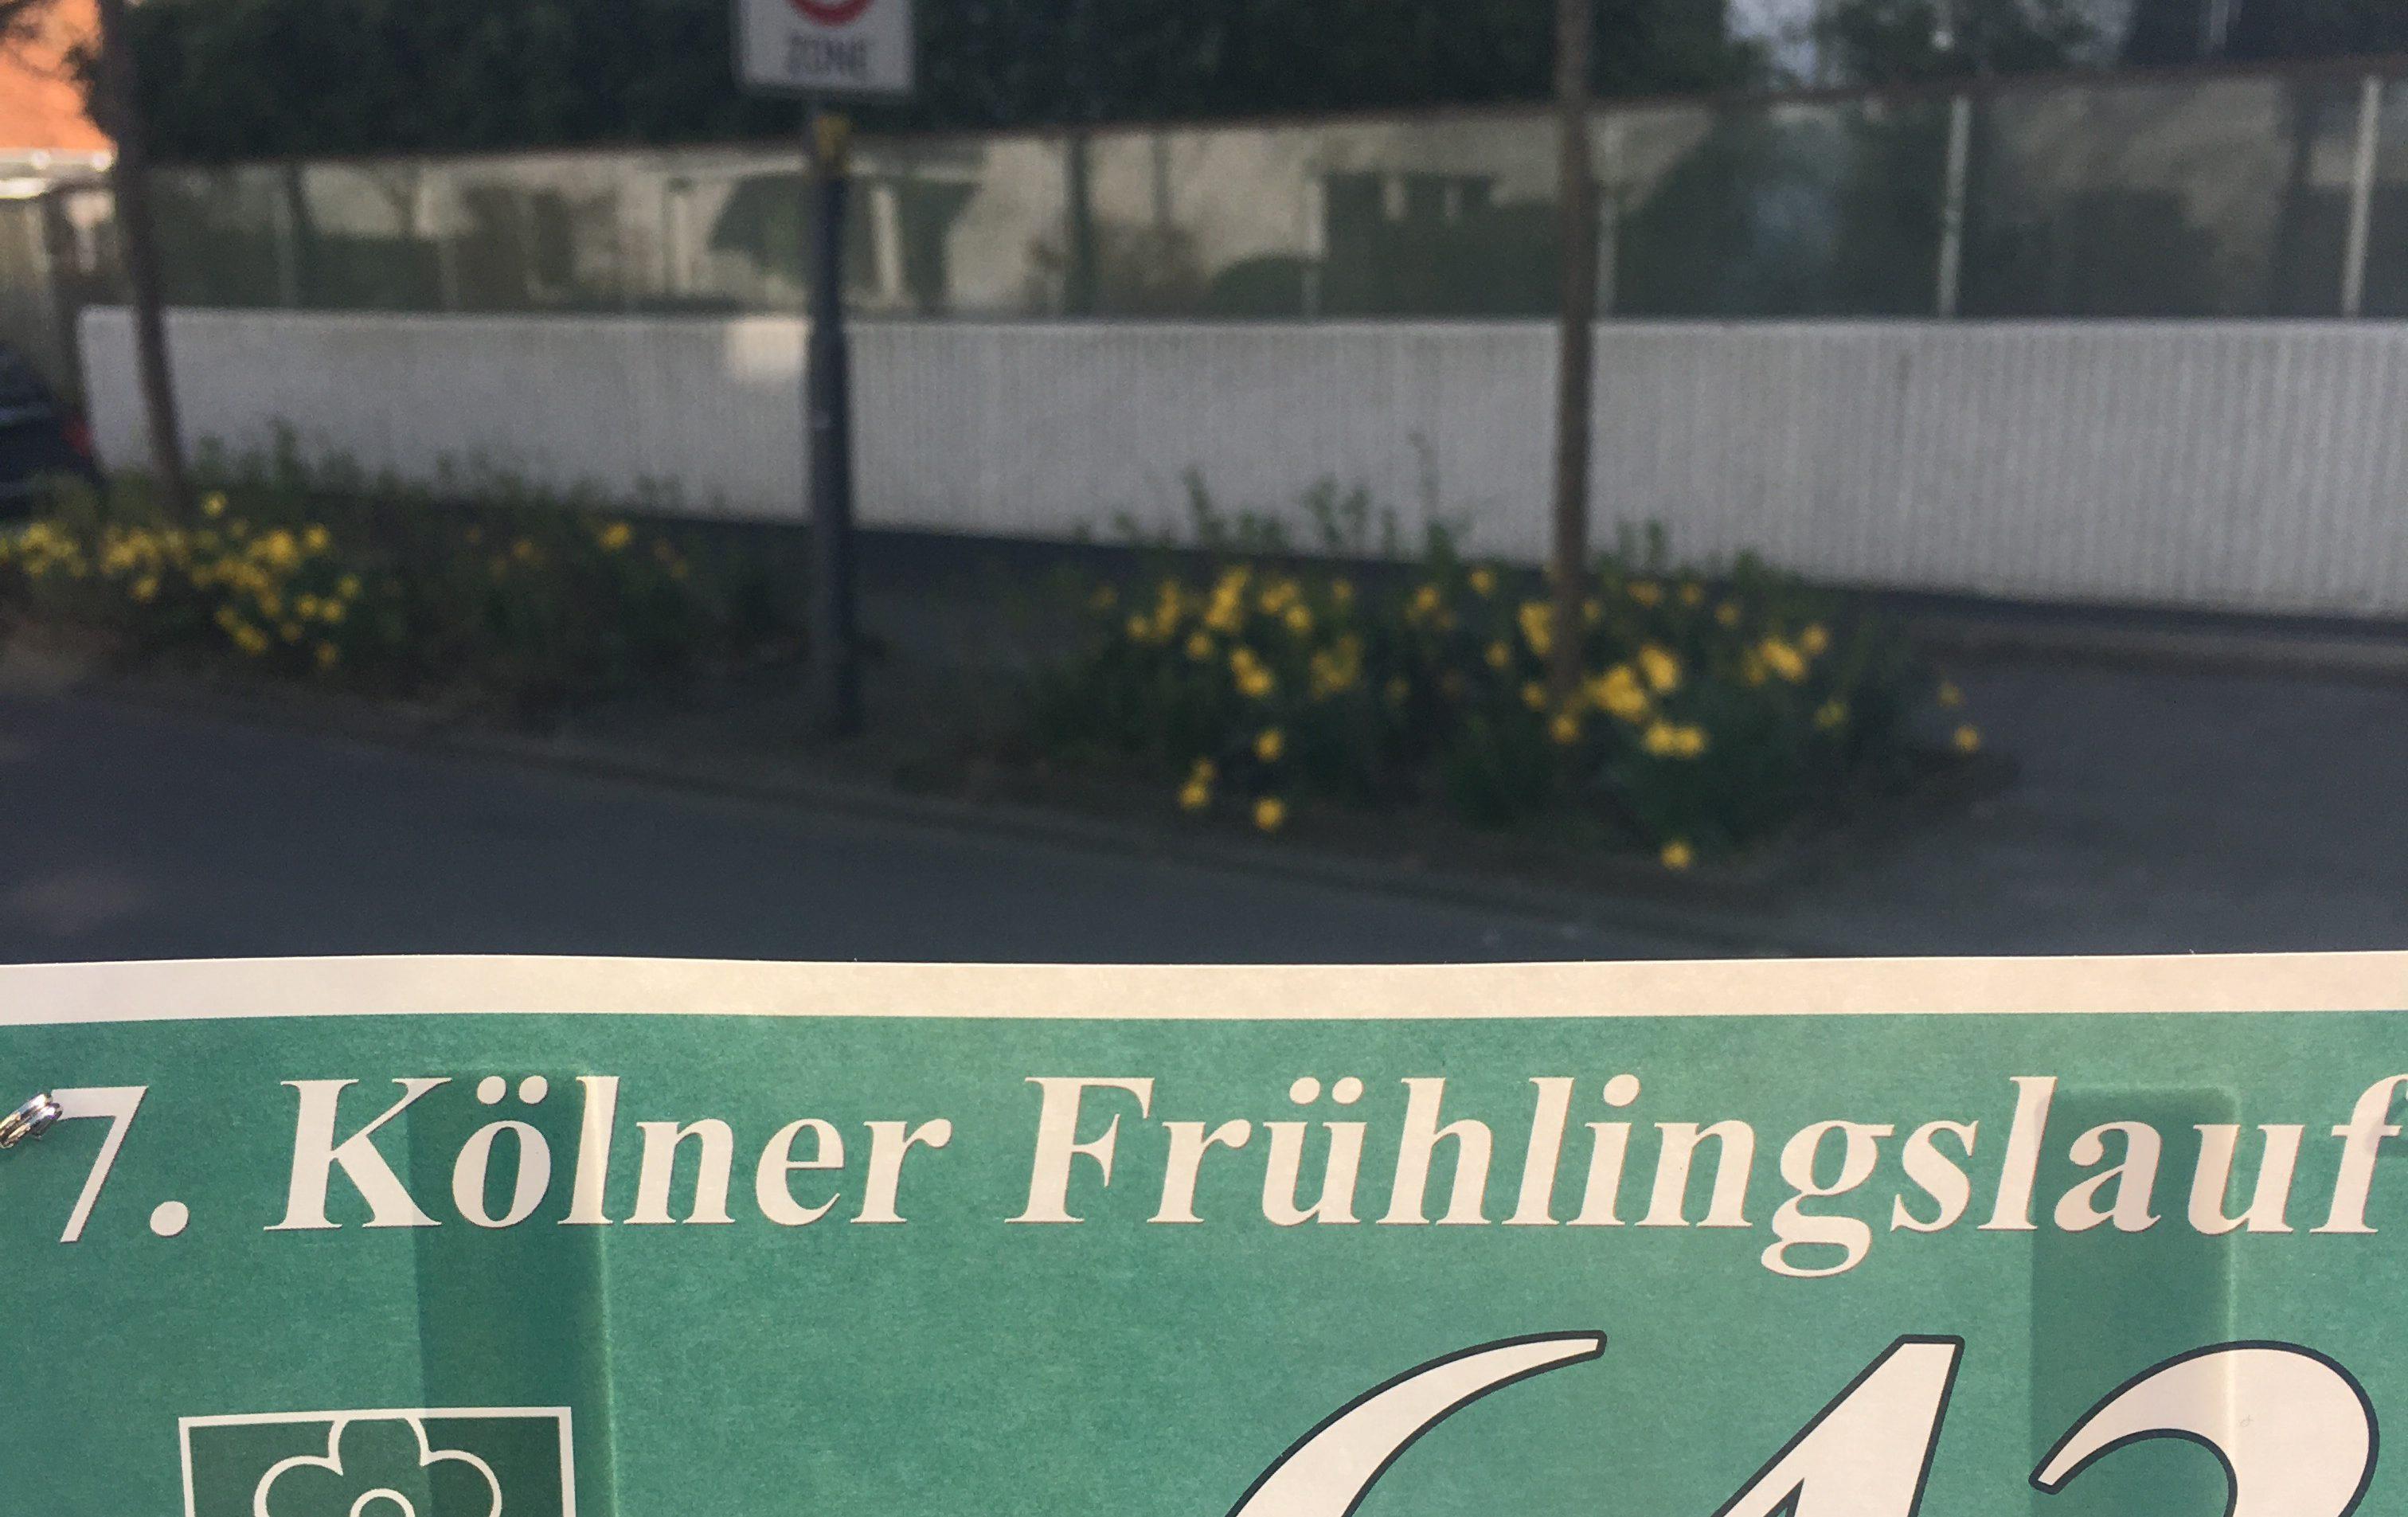 Kölner Frühulingslauf